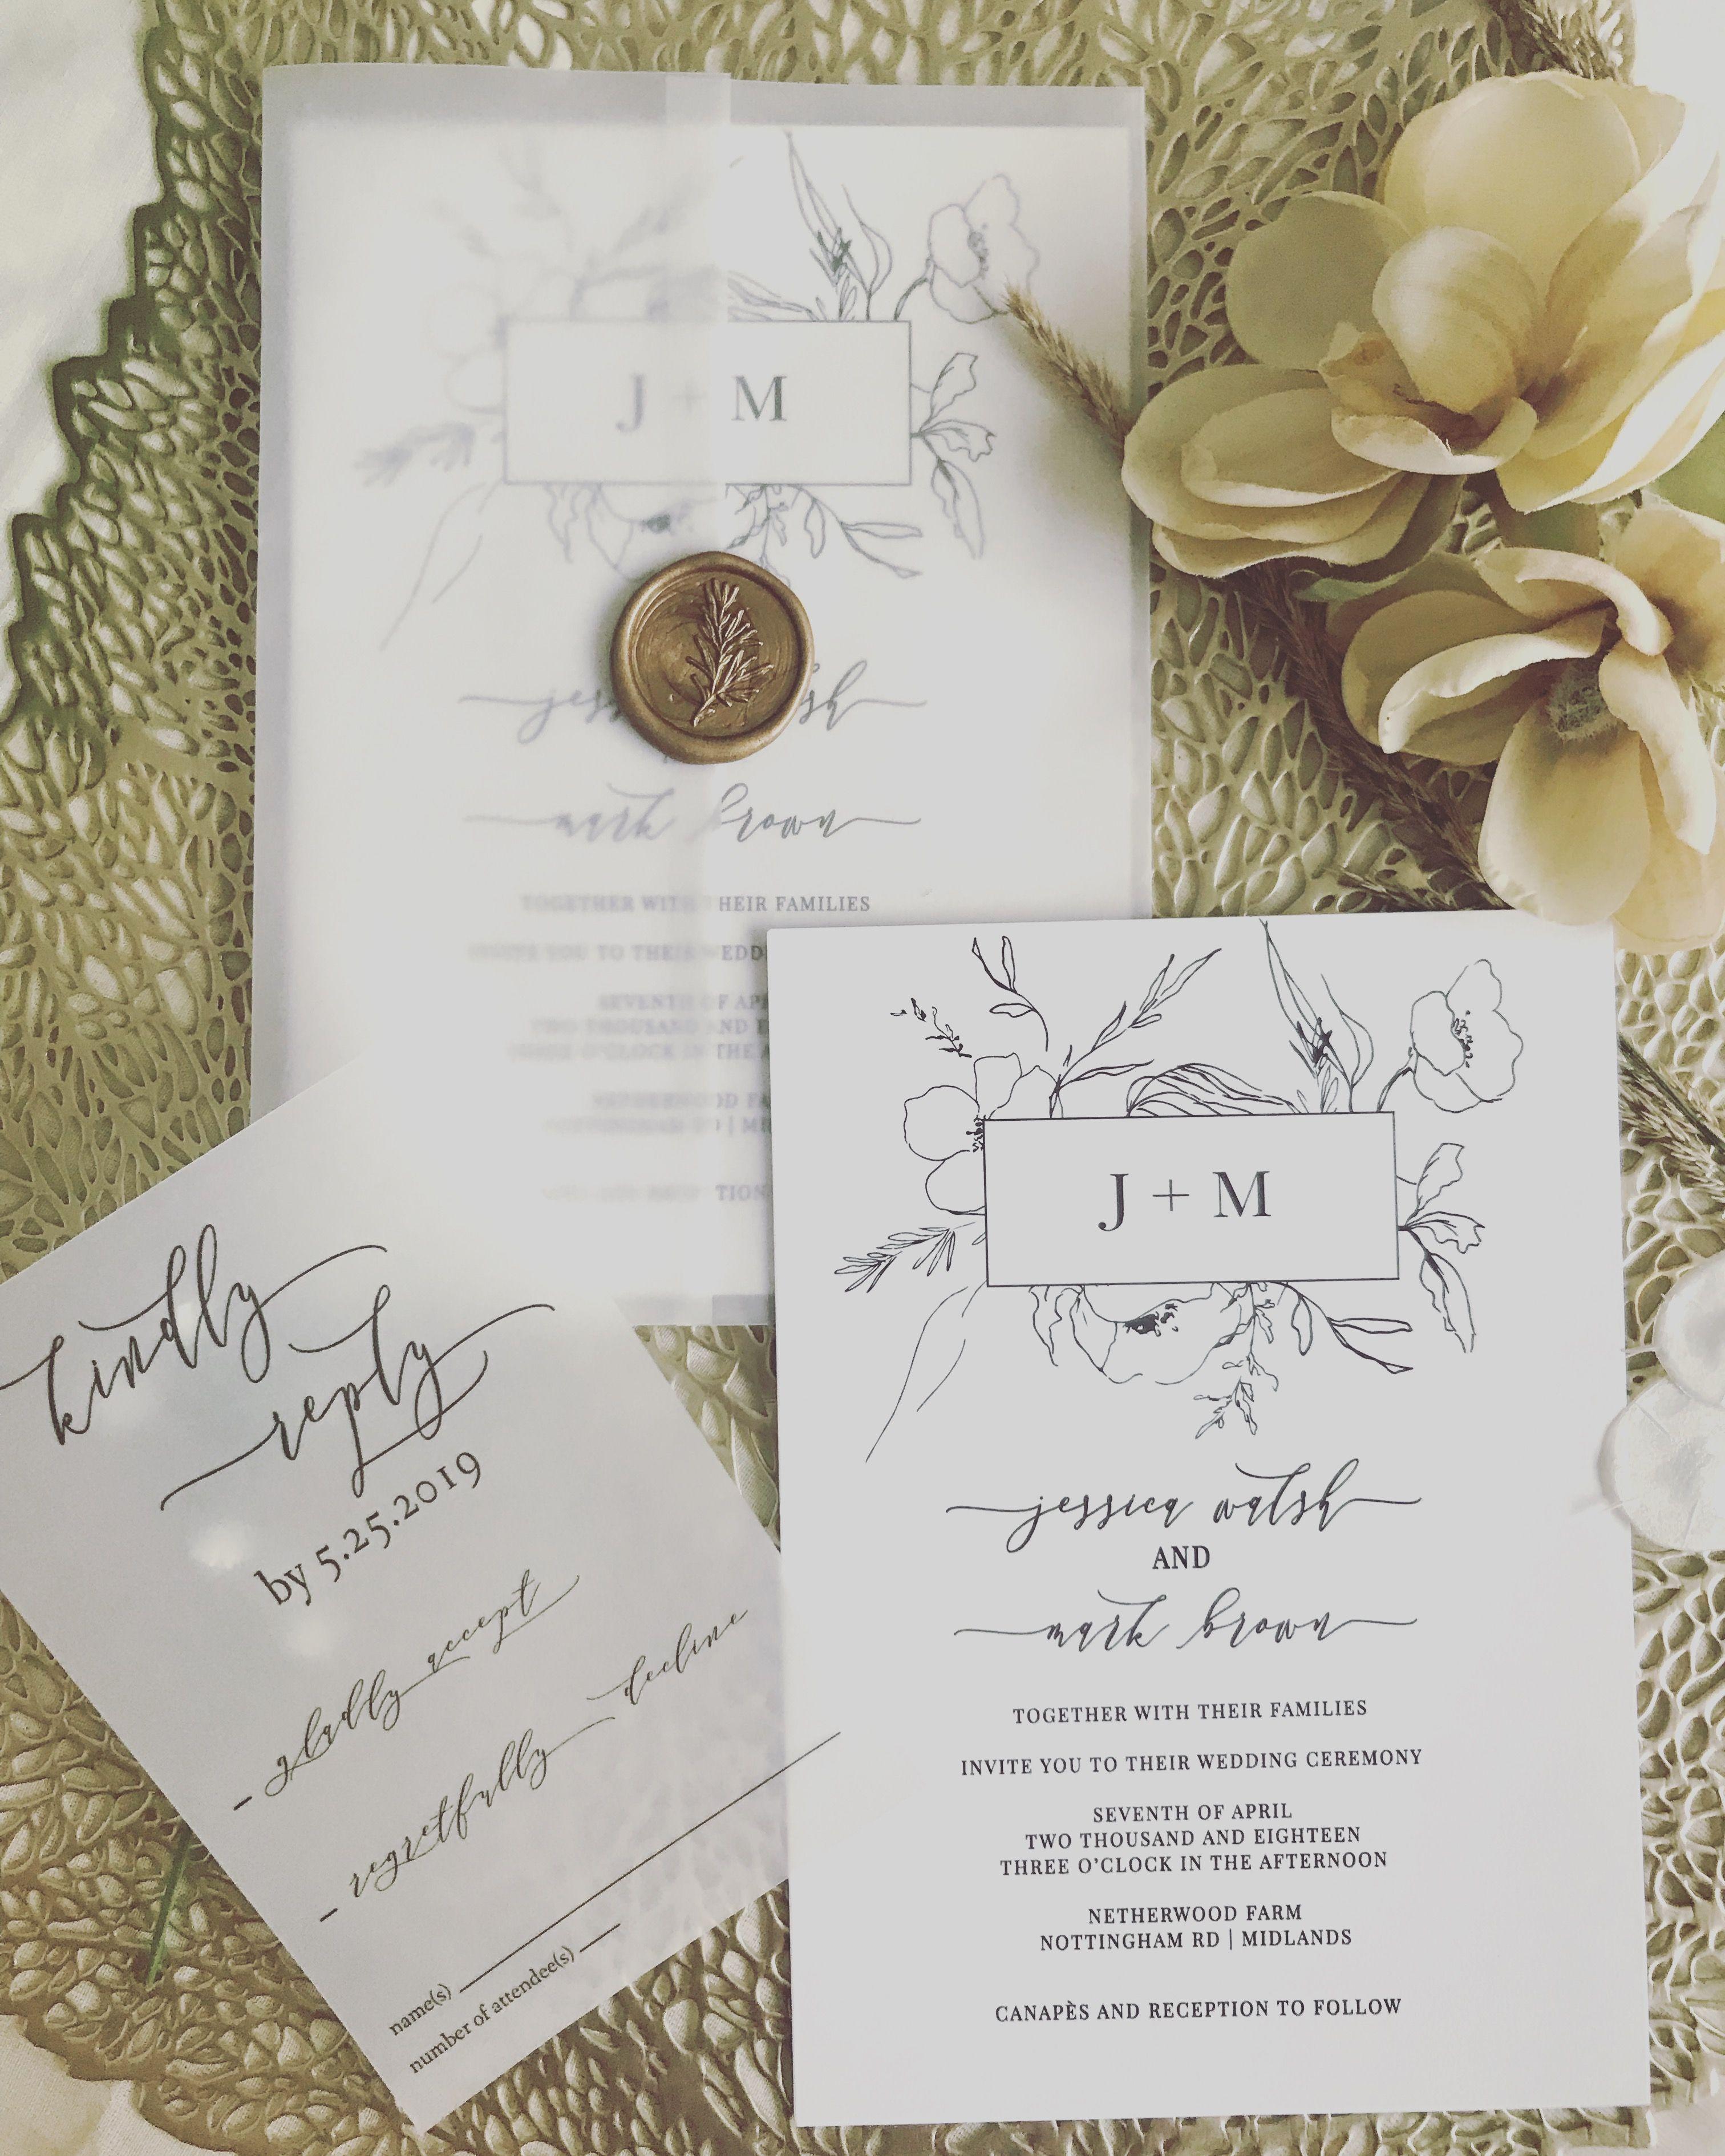 Vellum Wrap Botanical Invitations With Wax Seal Modern Wedding Invitations Cheap Wedding Invitations Wedding Invitation Trends Botanical Invitations